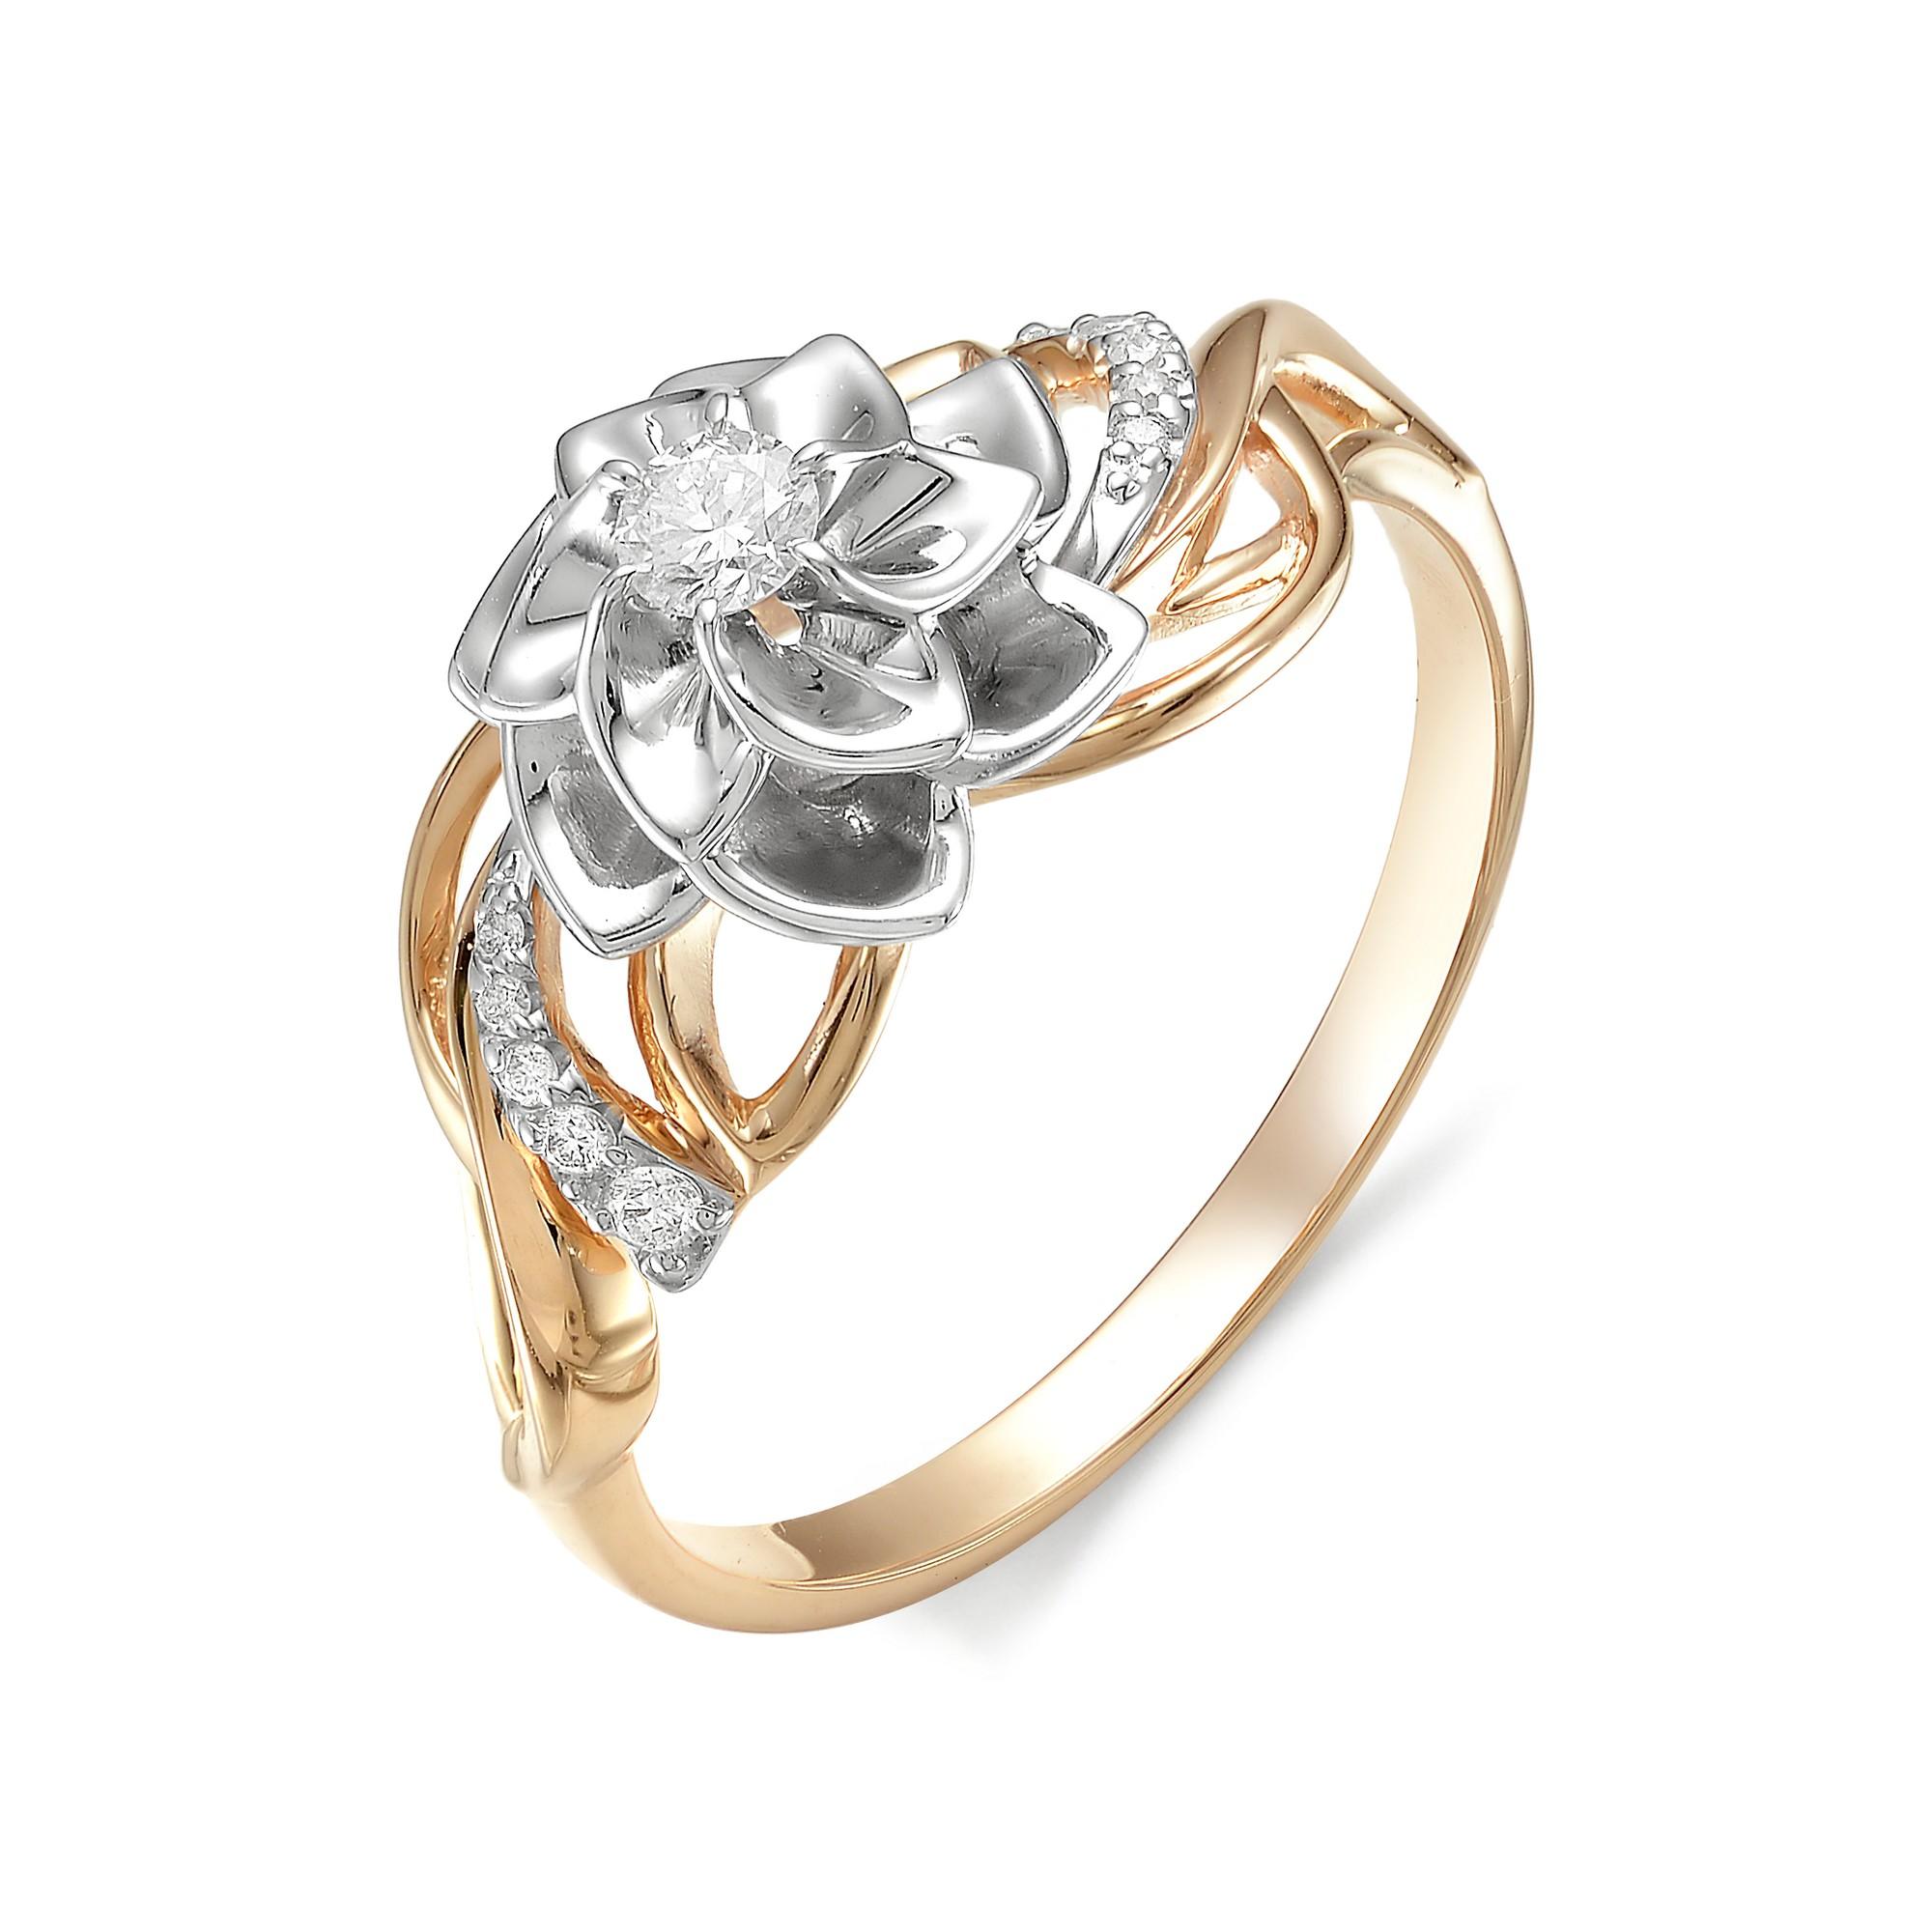 картинка кольцо 11909-100 1 бриллиант круг 57 0,096 10-15 4/6а, 2 бриллиант круг 57 0,024 60-90 4/5а, 2 бриллиант круг 57 0,013 120-200 4/5а, 6 бриллиант круг 57 0,020 200-400 4/5а 11909-100